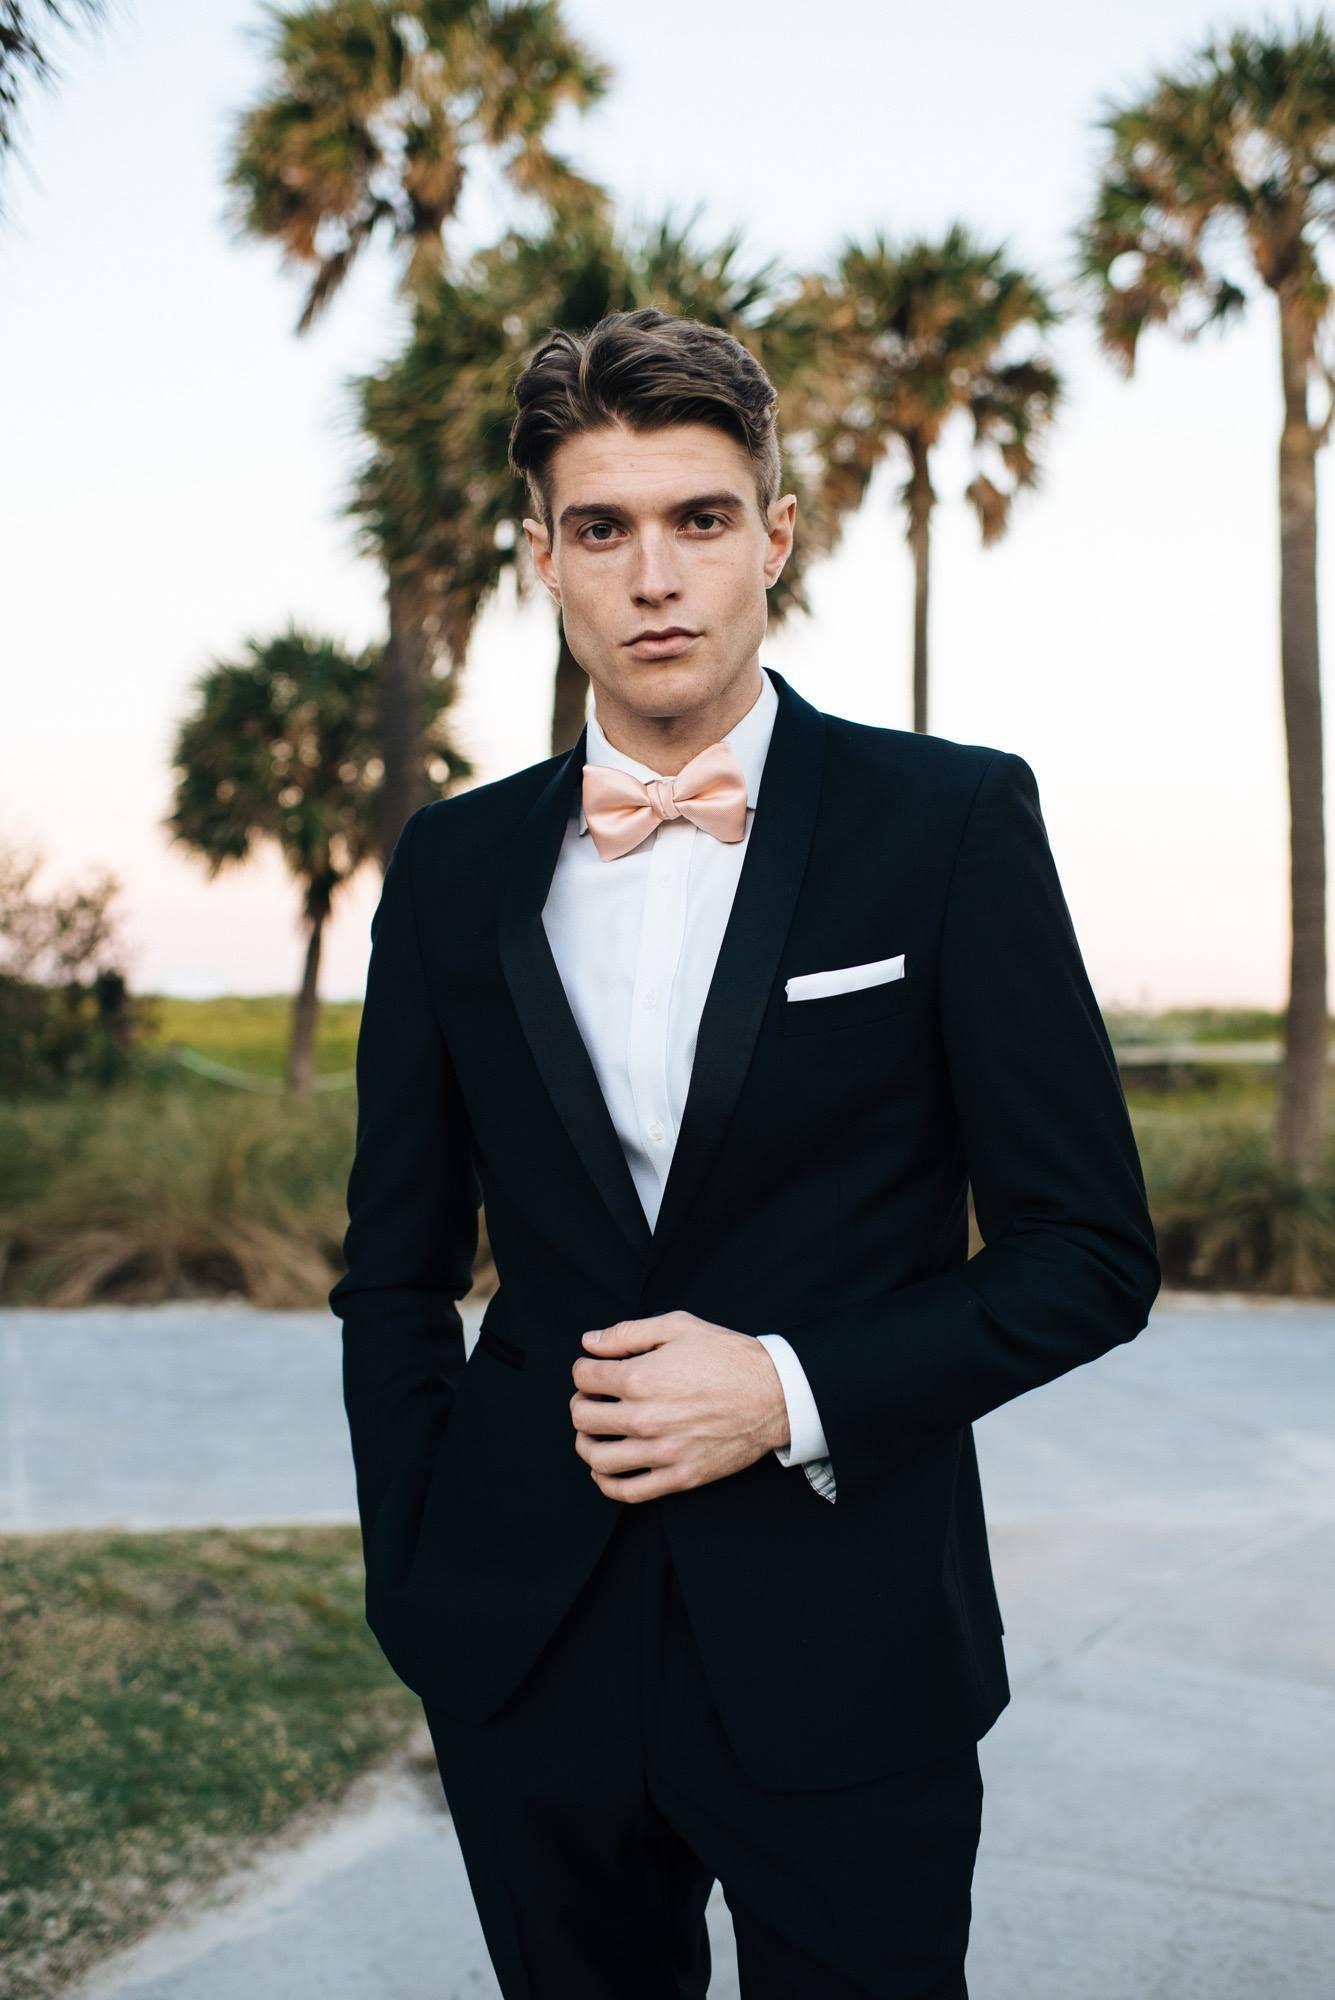 Black Suit with peach tie Tuxedo wedding, Wedding suits